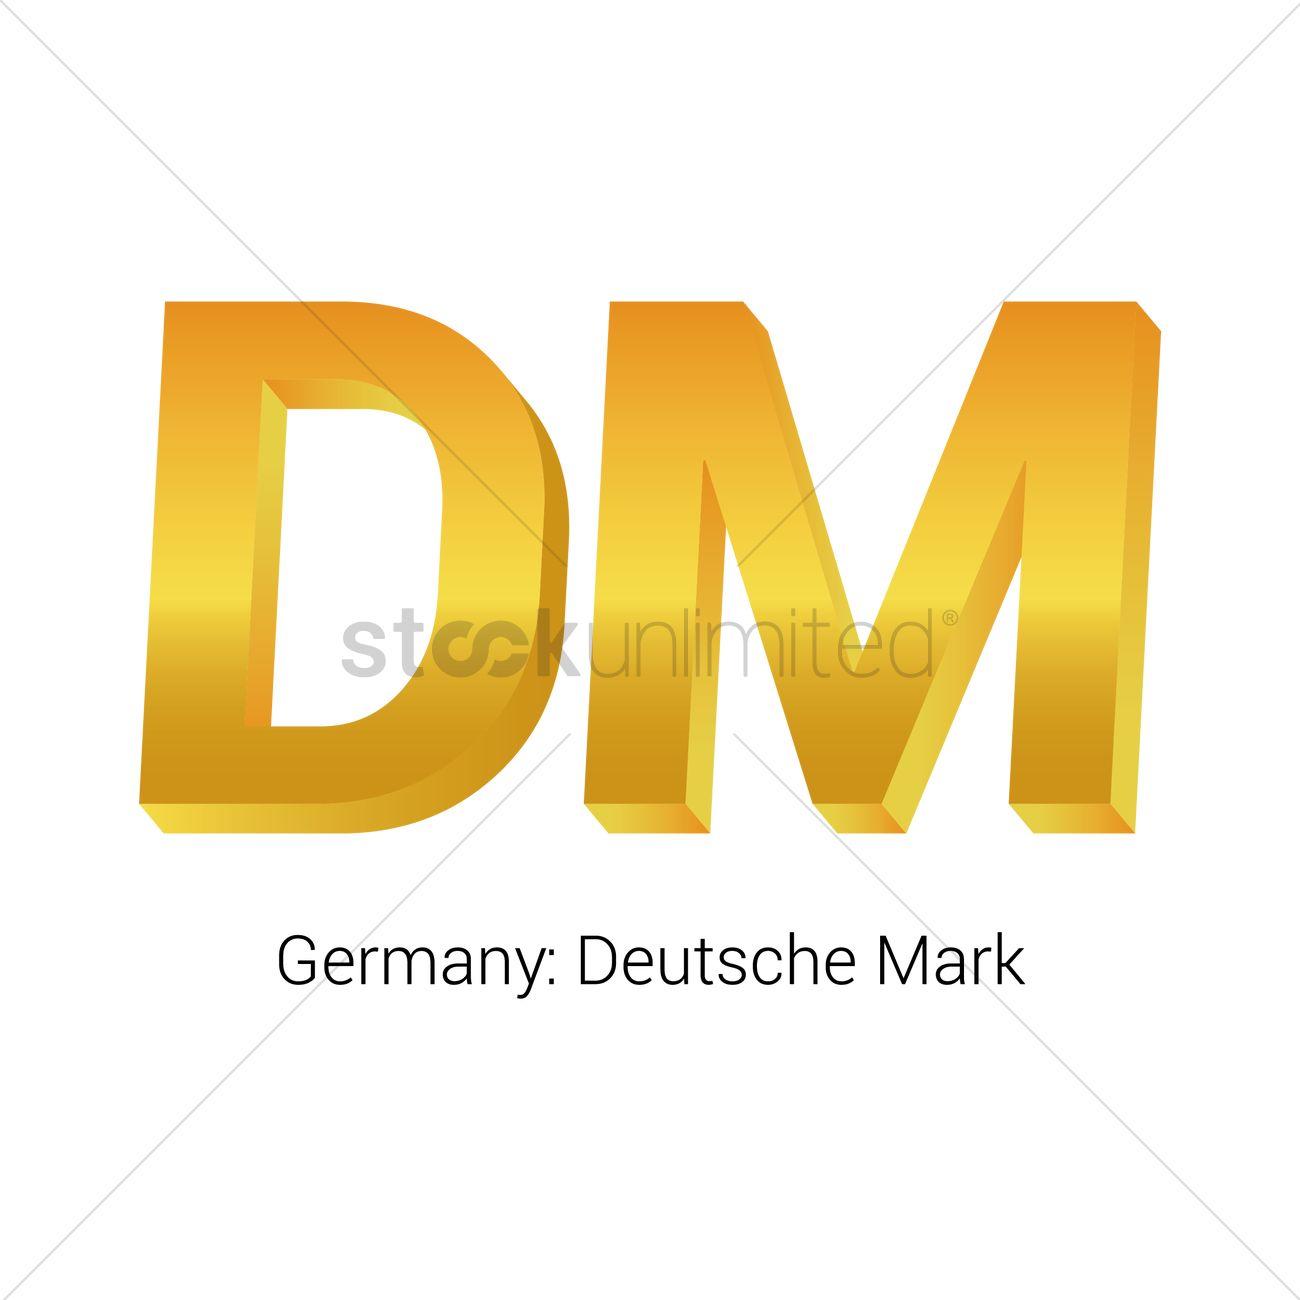 Deutsche mark currency symbol vector image 1821546 stockunlimited deutsche mark currency symbol vector graphic biocorpaavc Image collections